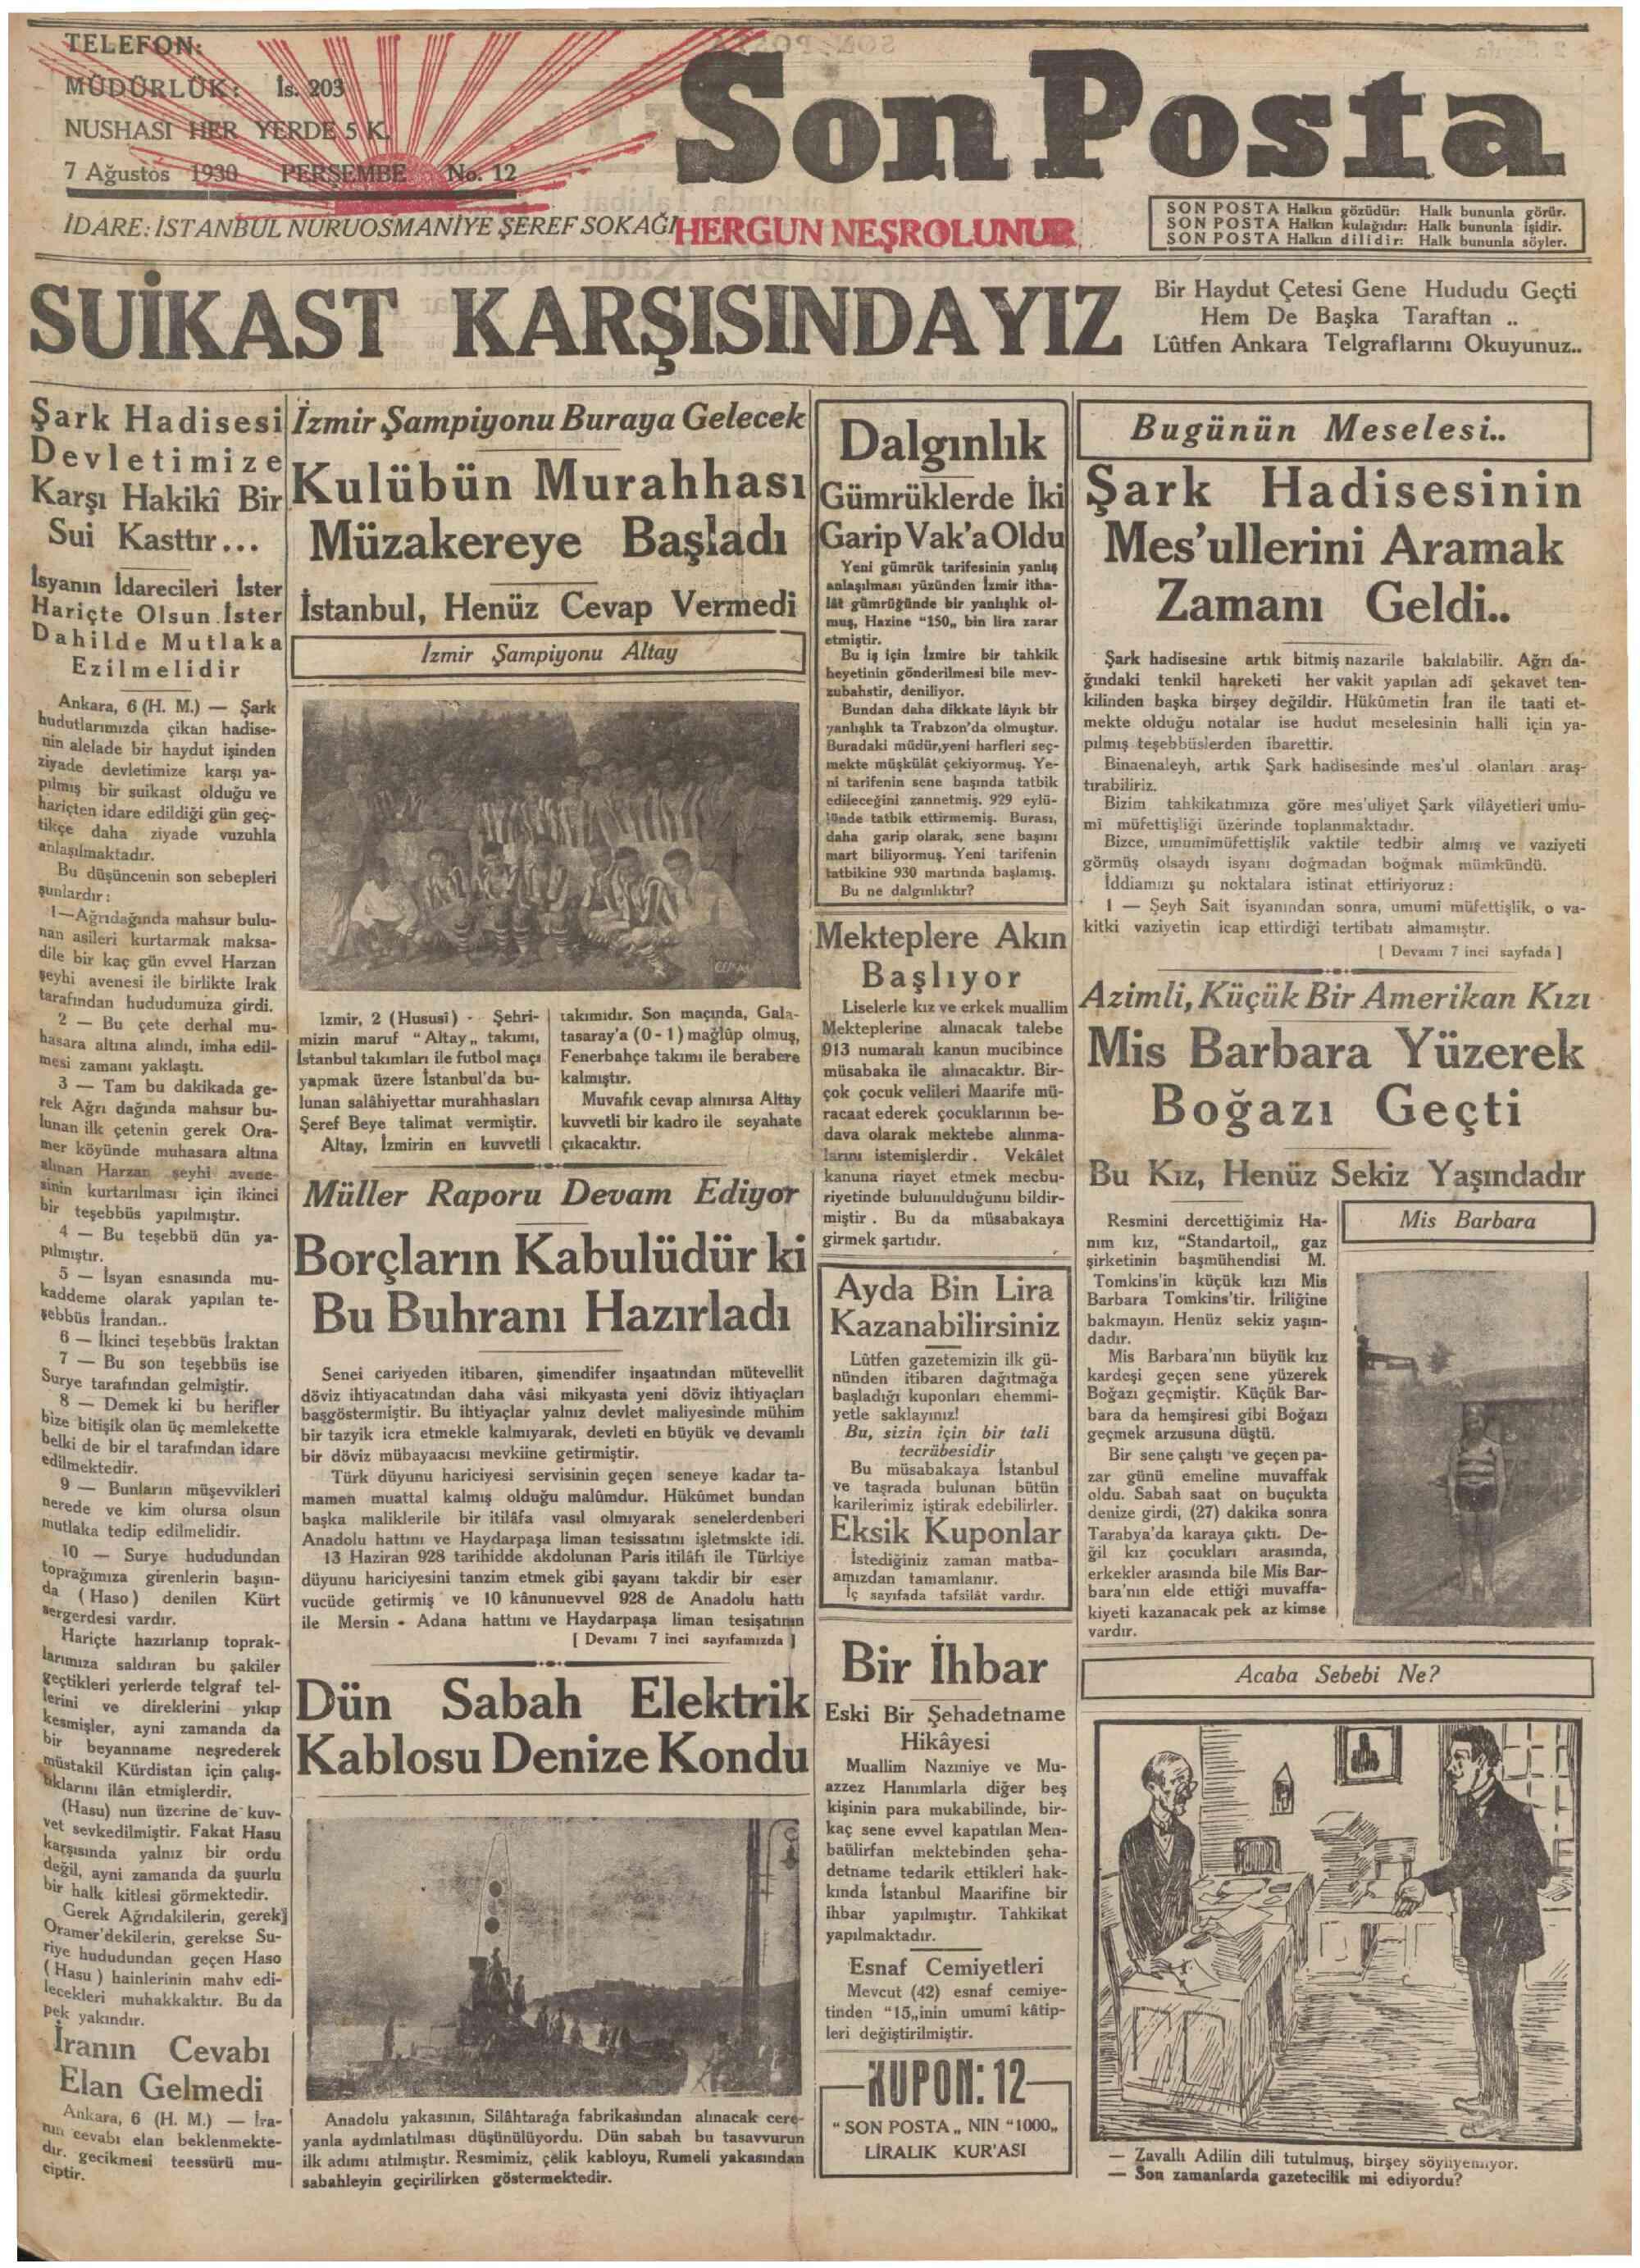 7 Ağustos 1930 Tarihli Son Posta Gazetesi Sayfa 1